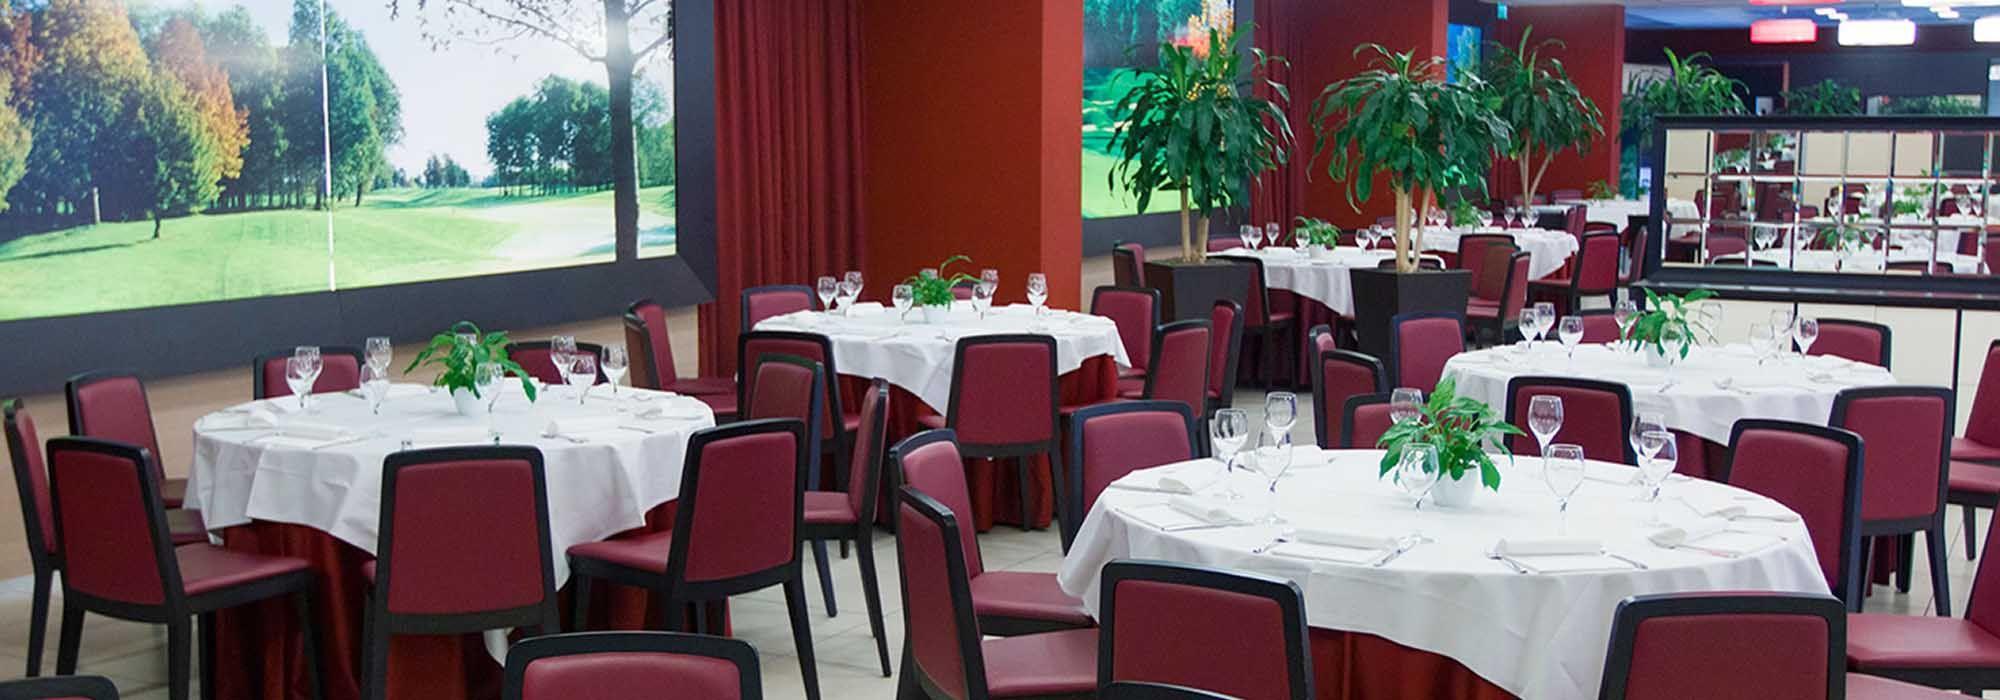 Hotel Le Robinie Centro Convegni | Varese Convention